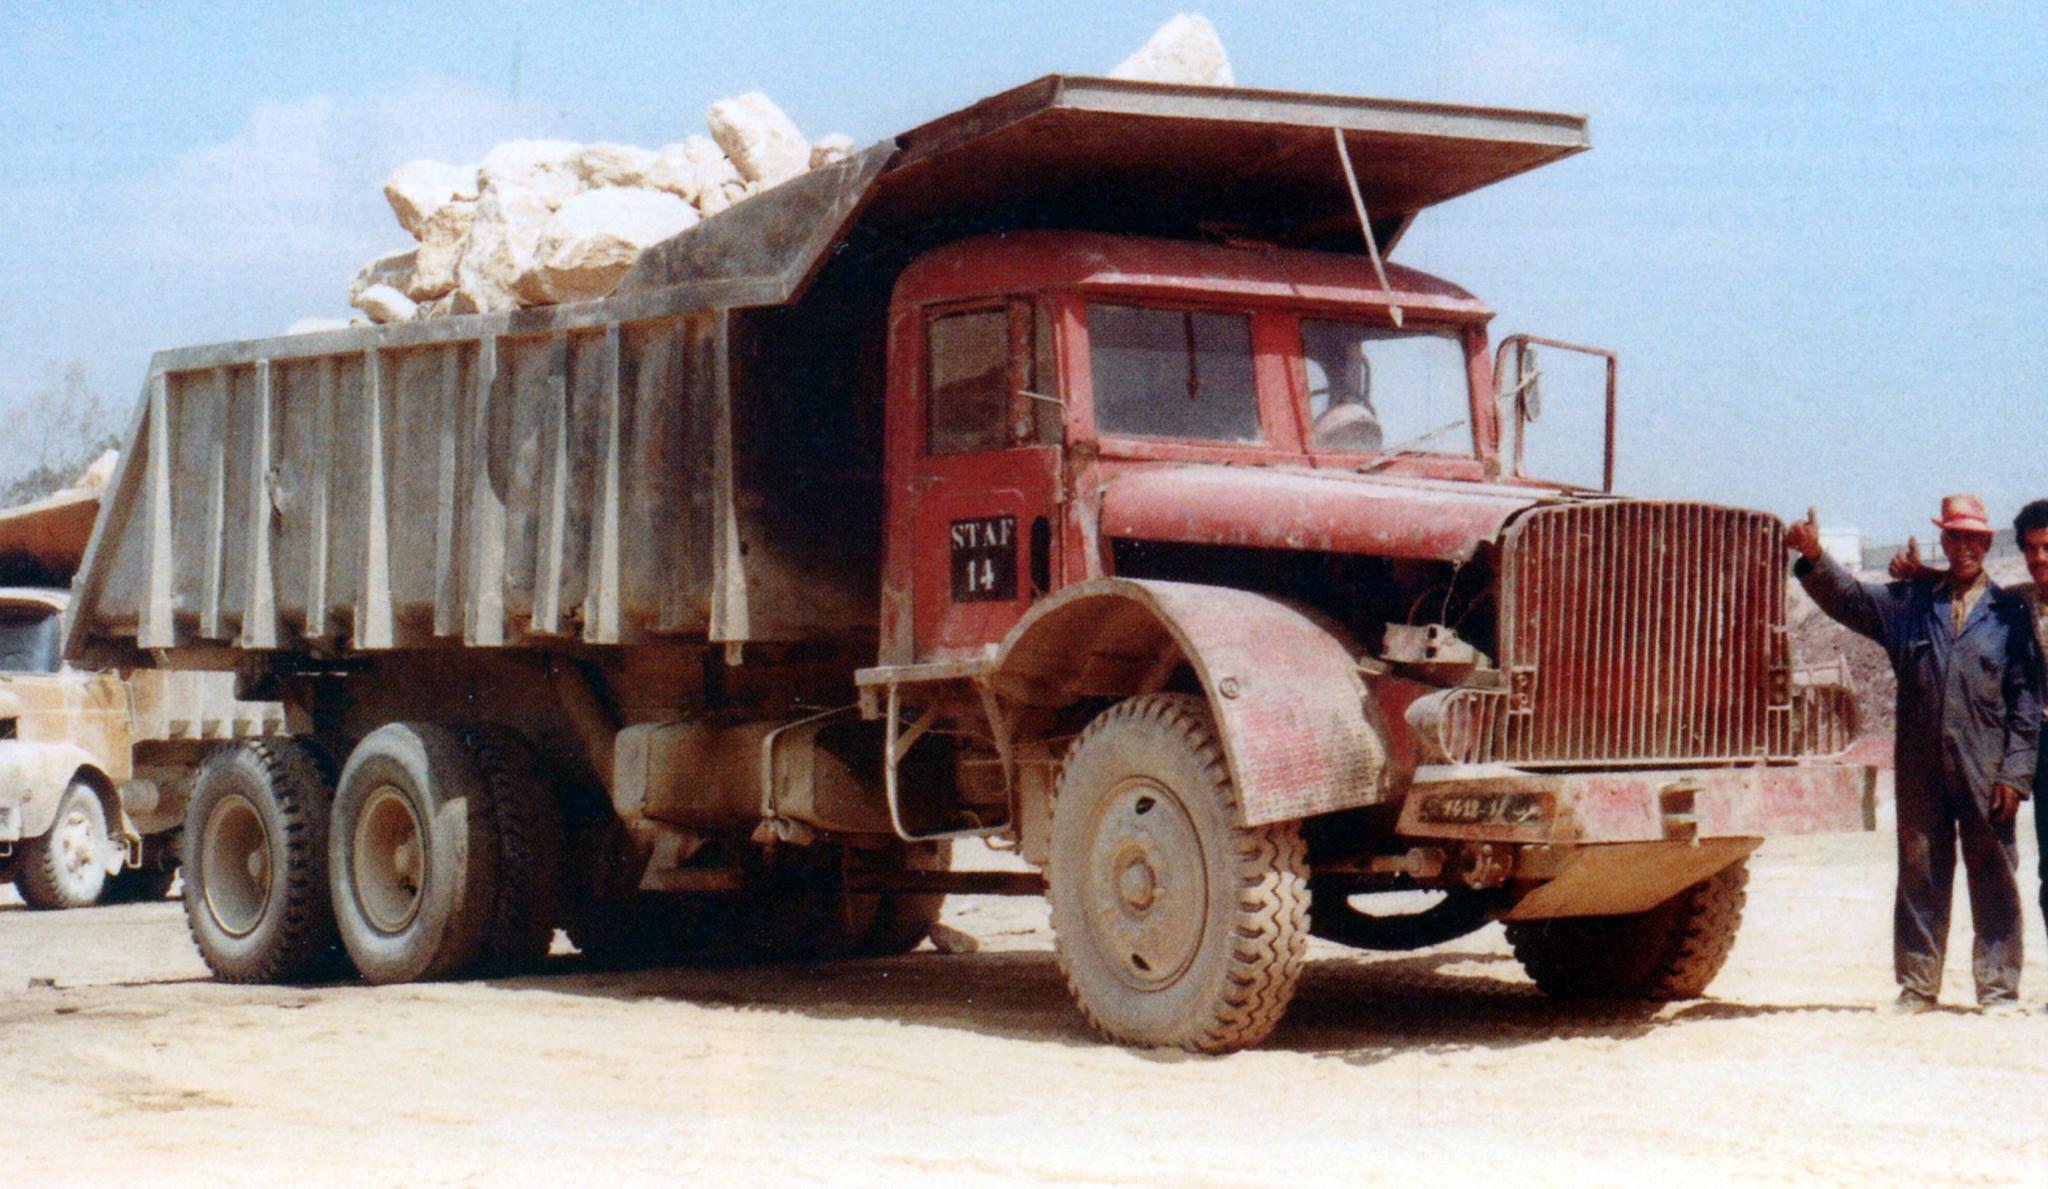 Transport Routier au Maroc - Histoire - Page 3 49885182188_e250daedf3_o_d